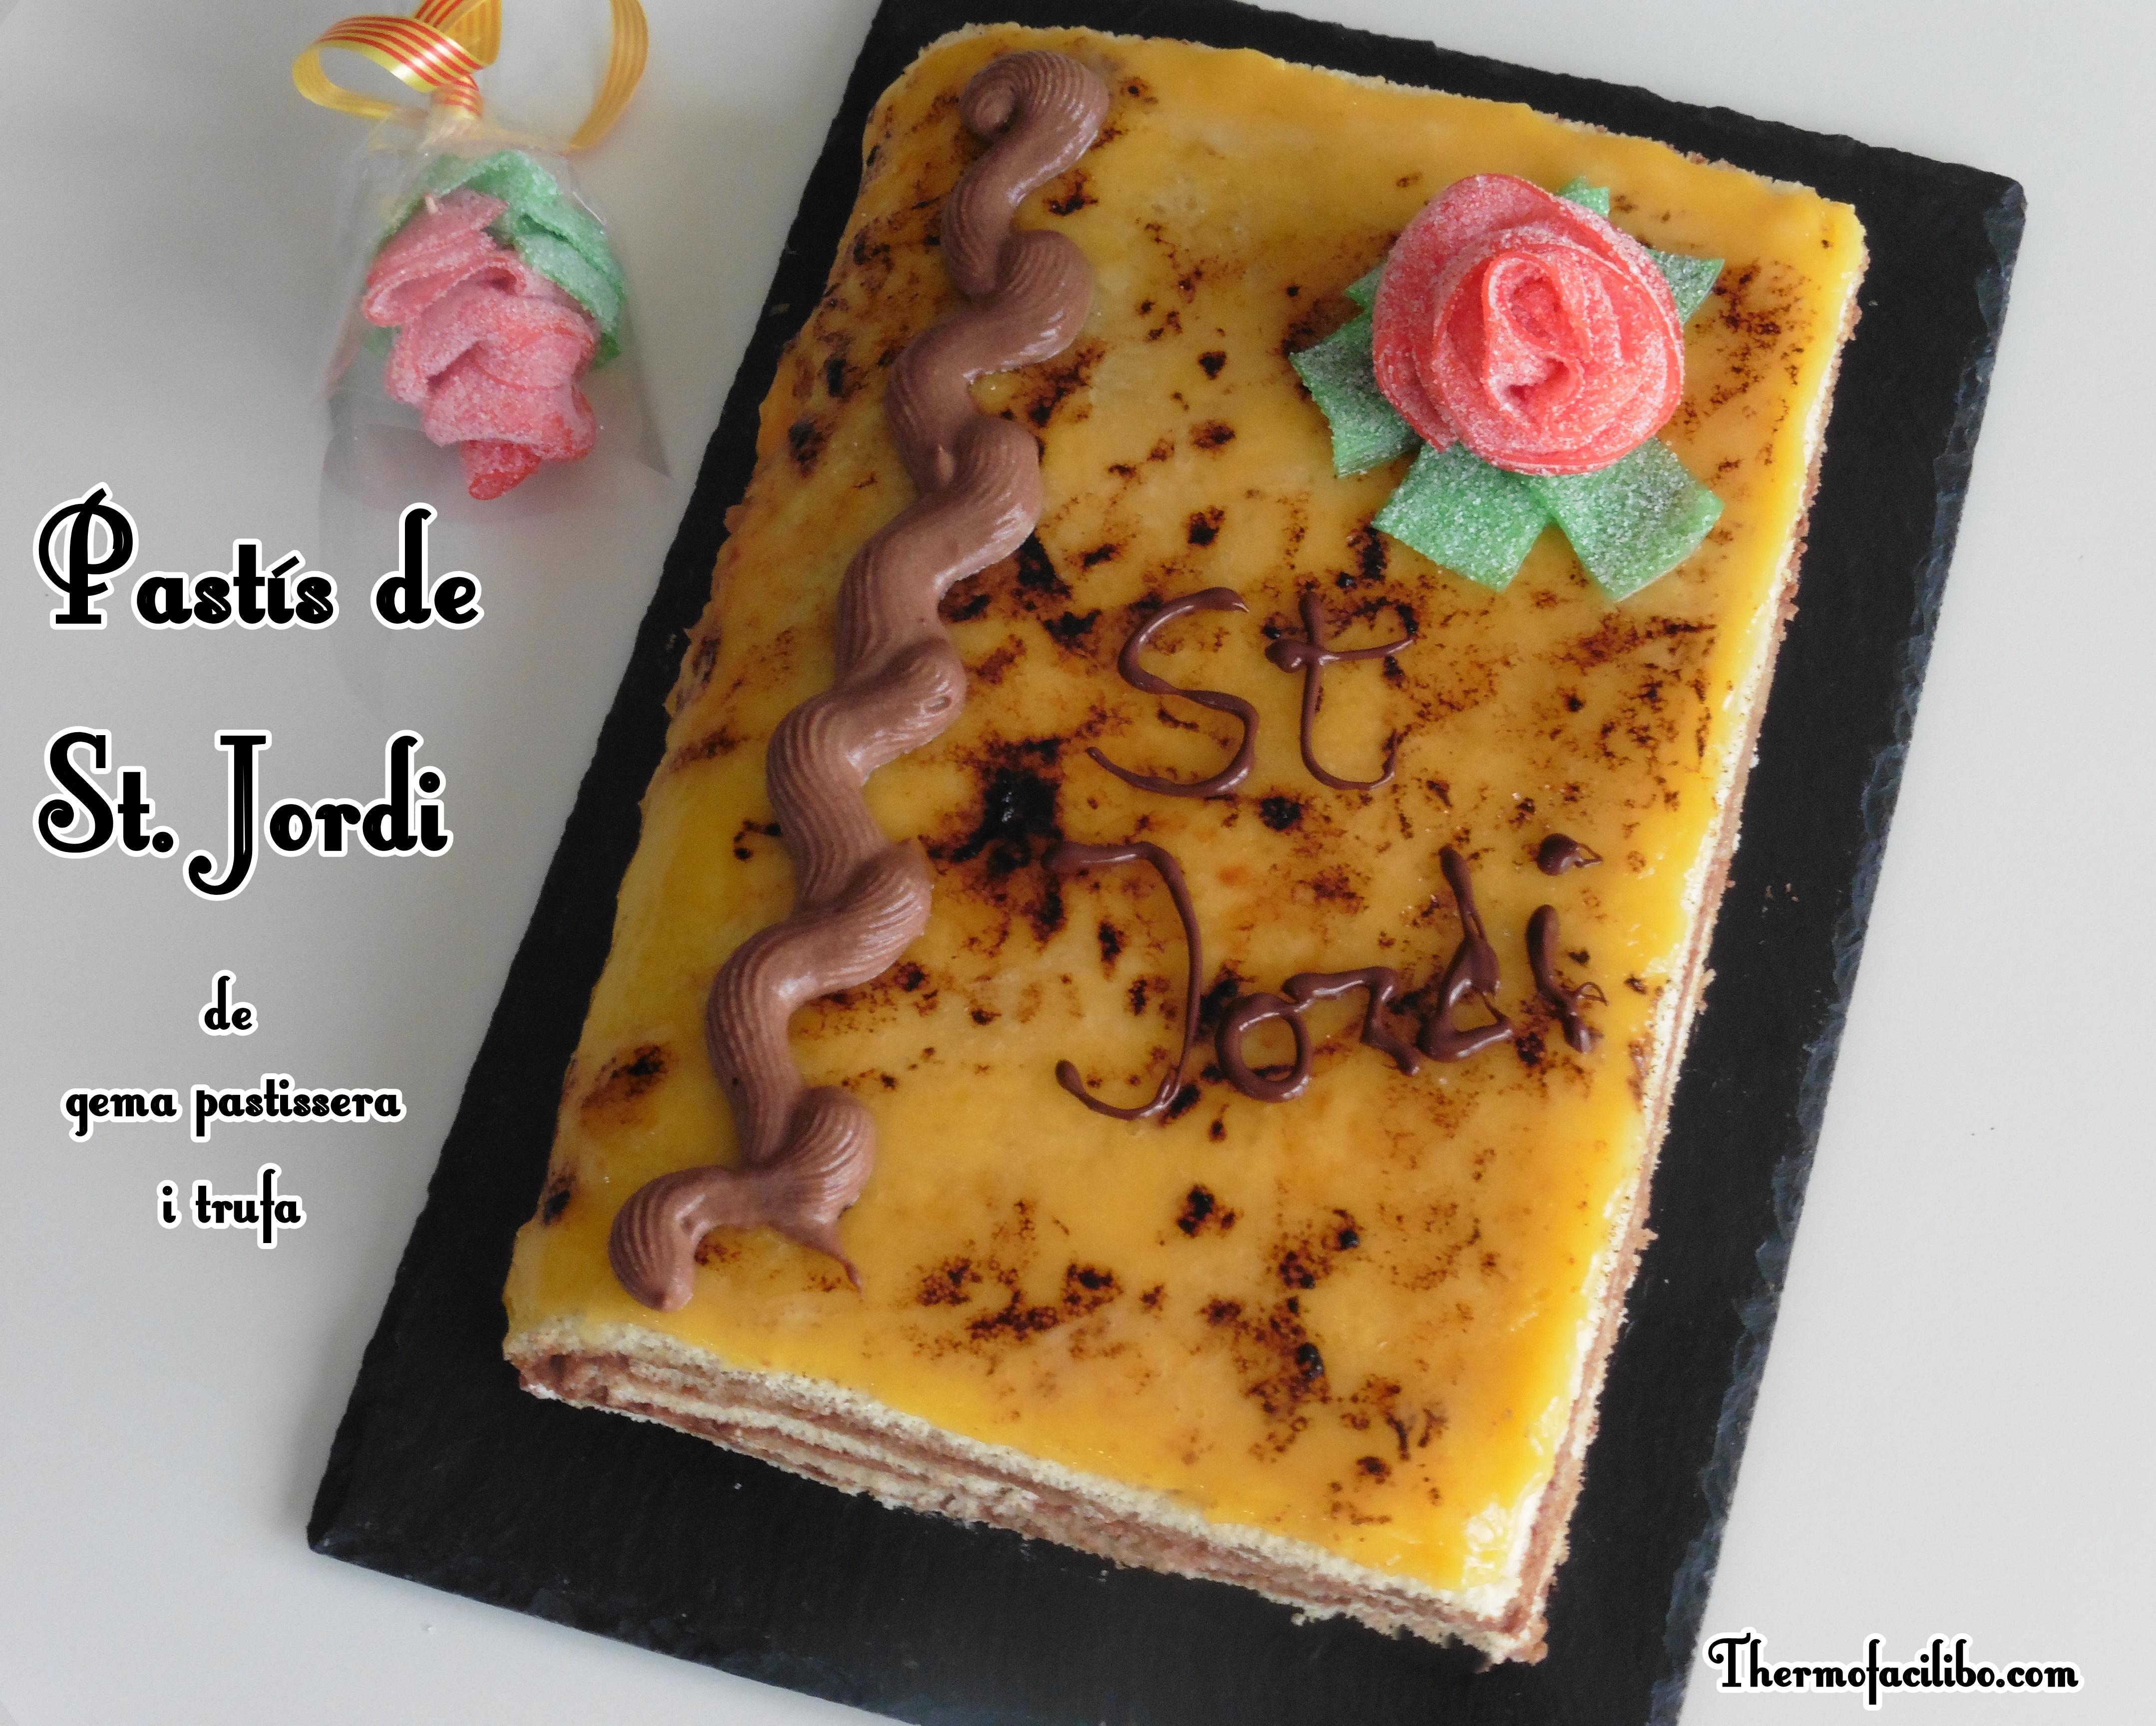 Pastís de St. Jordi de gema pastissera i trufa